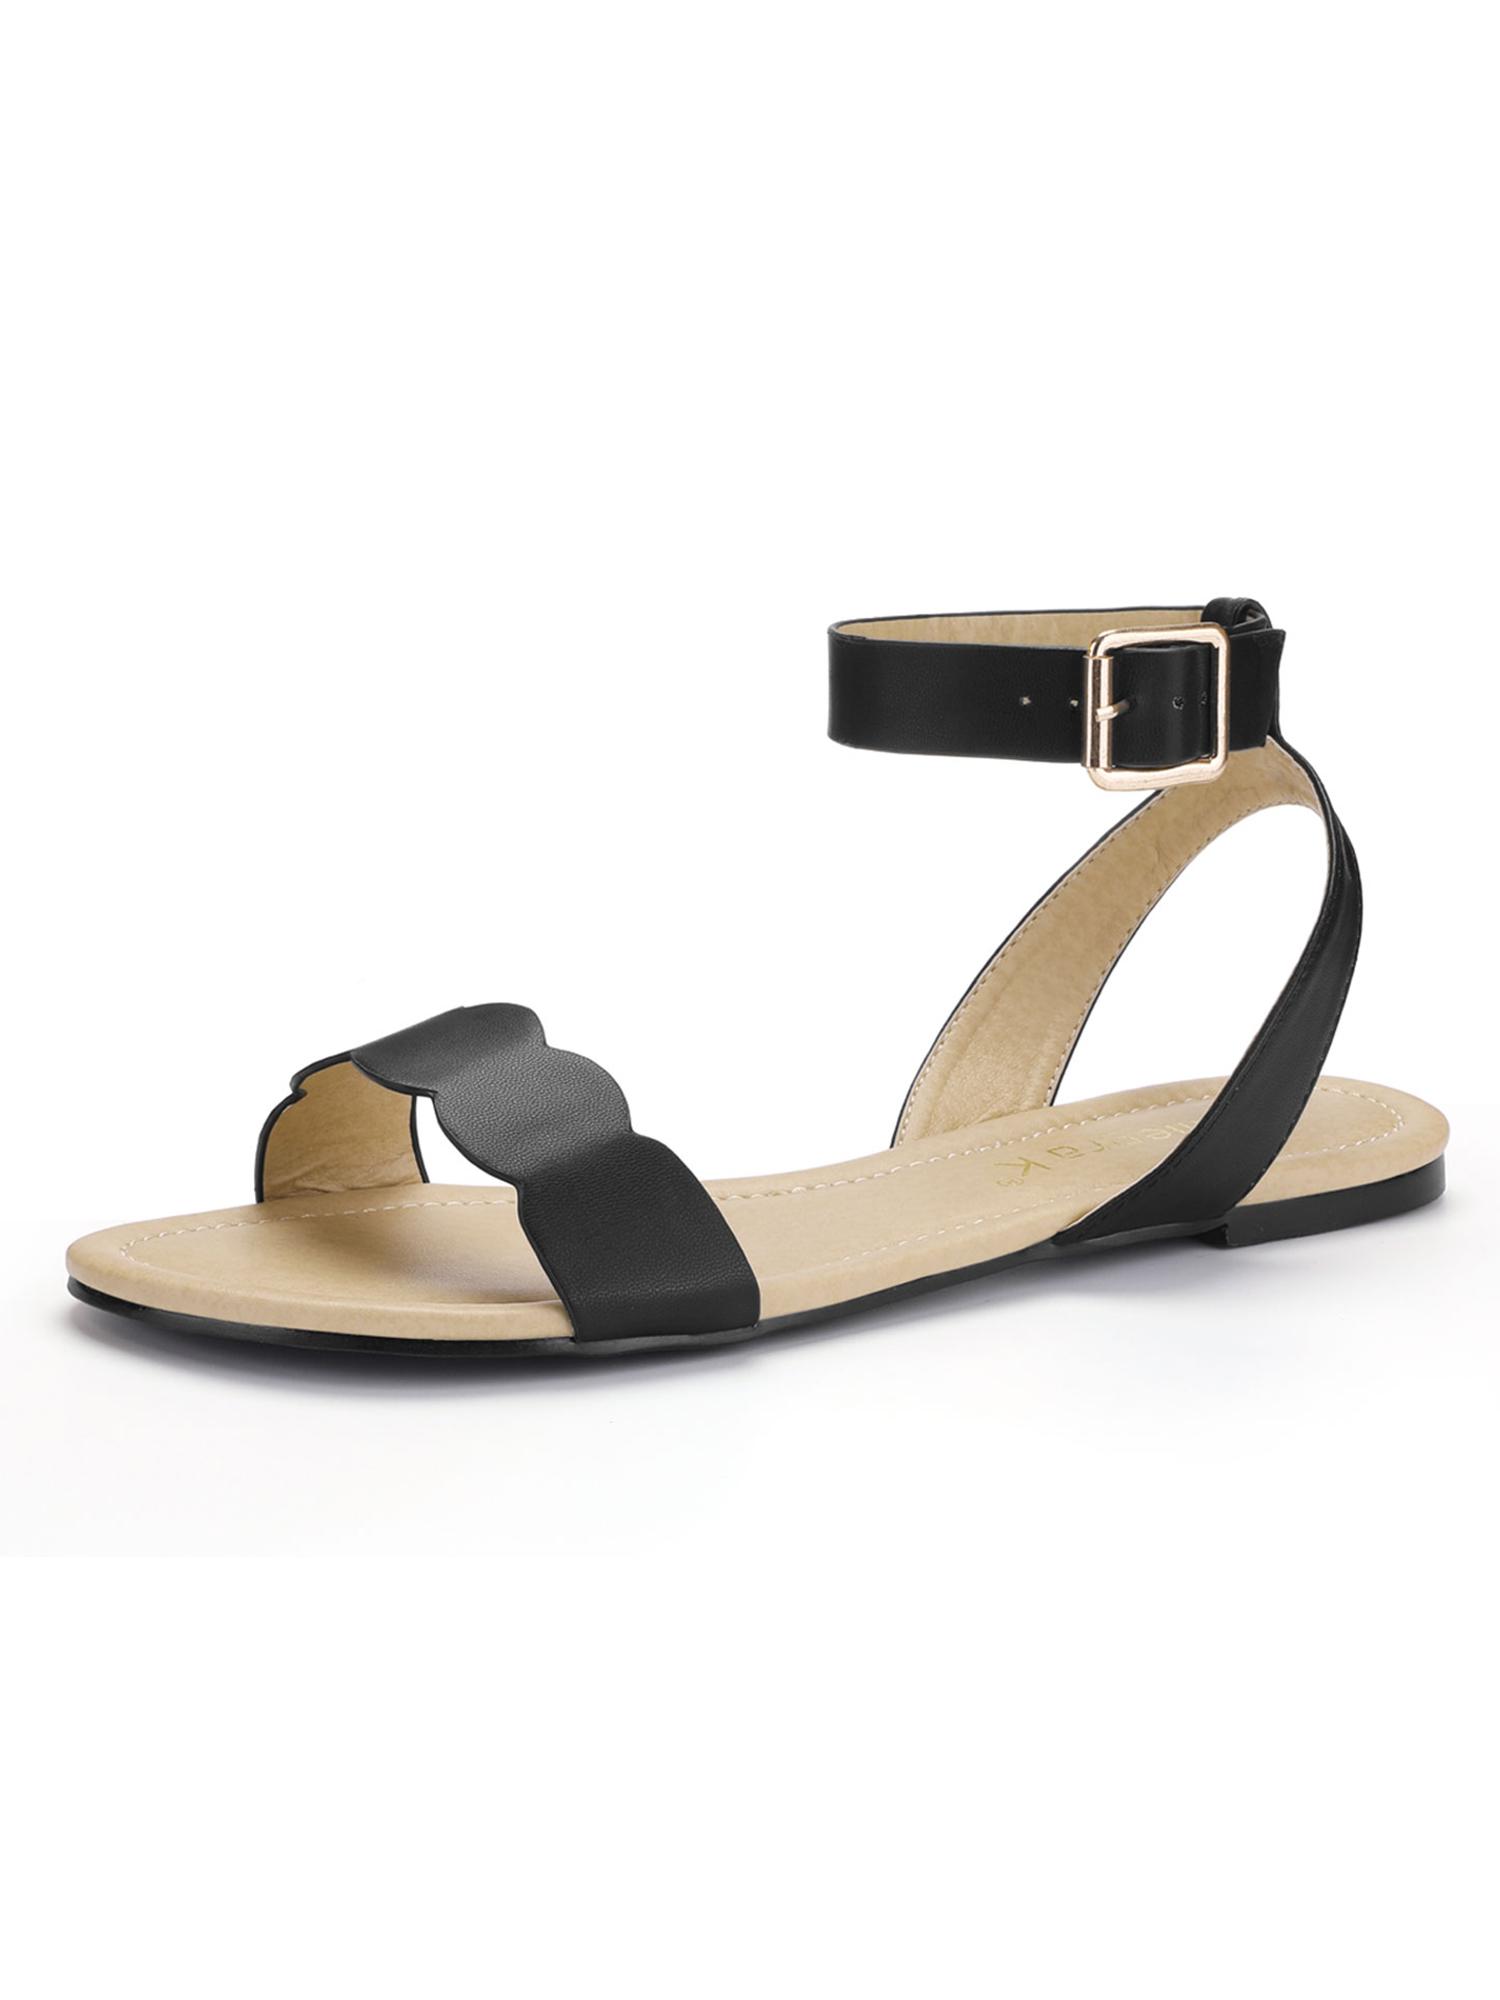 46c1a4f1a1a Cute black peep toe flat sandals M 560aaf2f4e95a3ff9c000b17 Source · Unique  Bargains Women s Open Toe Scalloped Edge Ankle Strap Flat